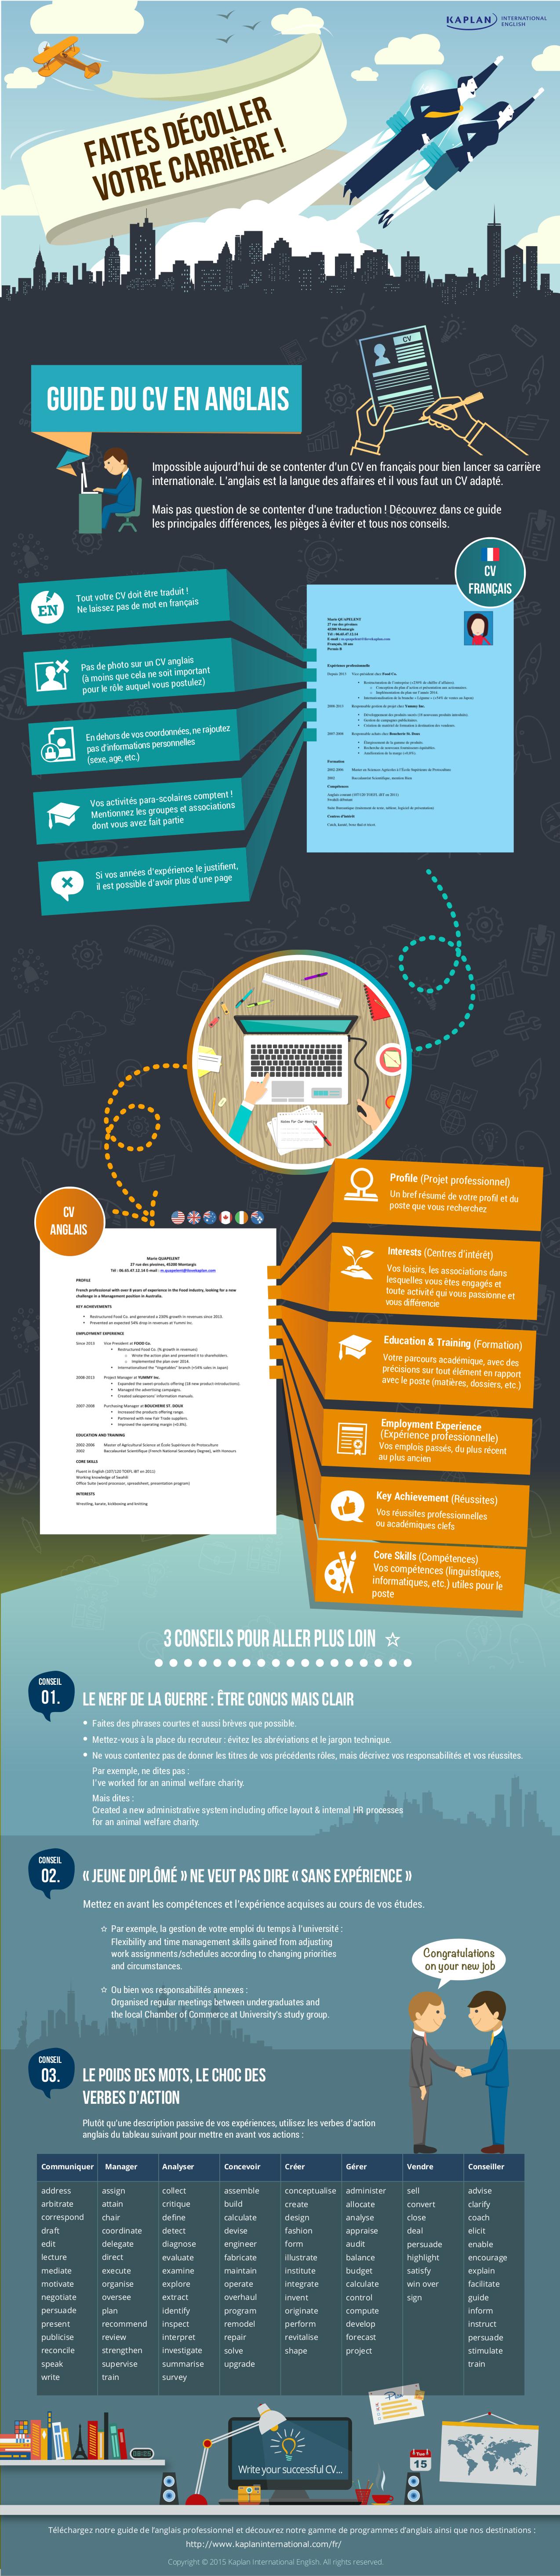 guide du cv en anglais  infographie